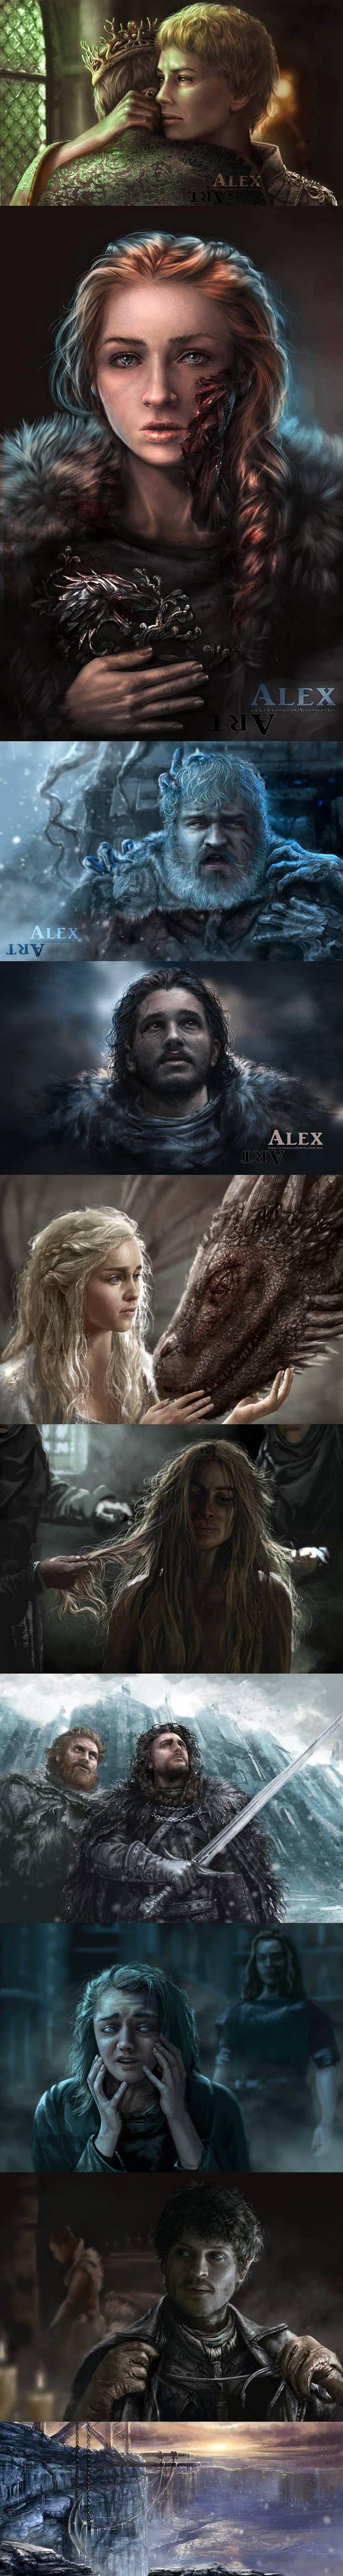 game-of-thrones-alex-art.jpg 653×4,907 píxeles